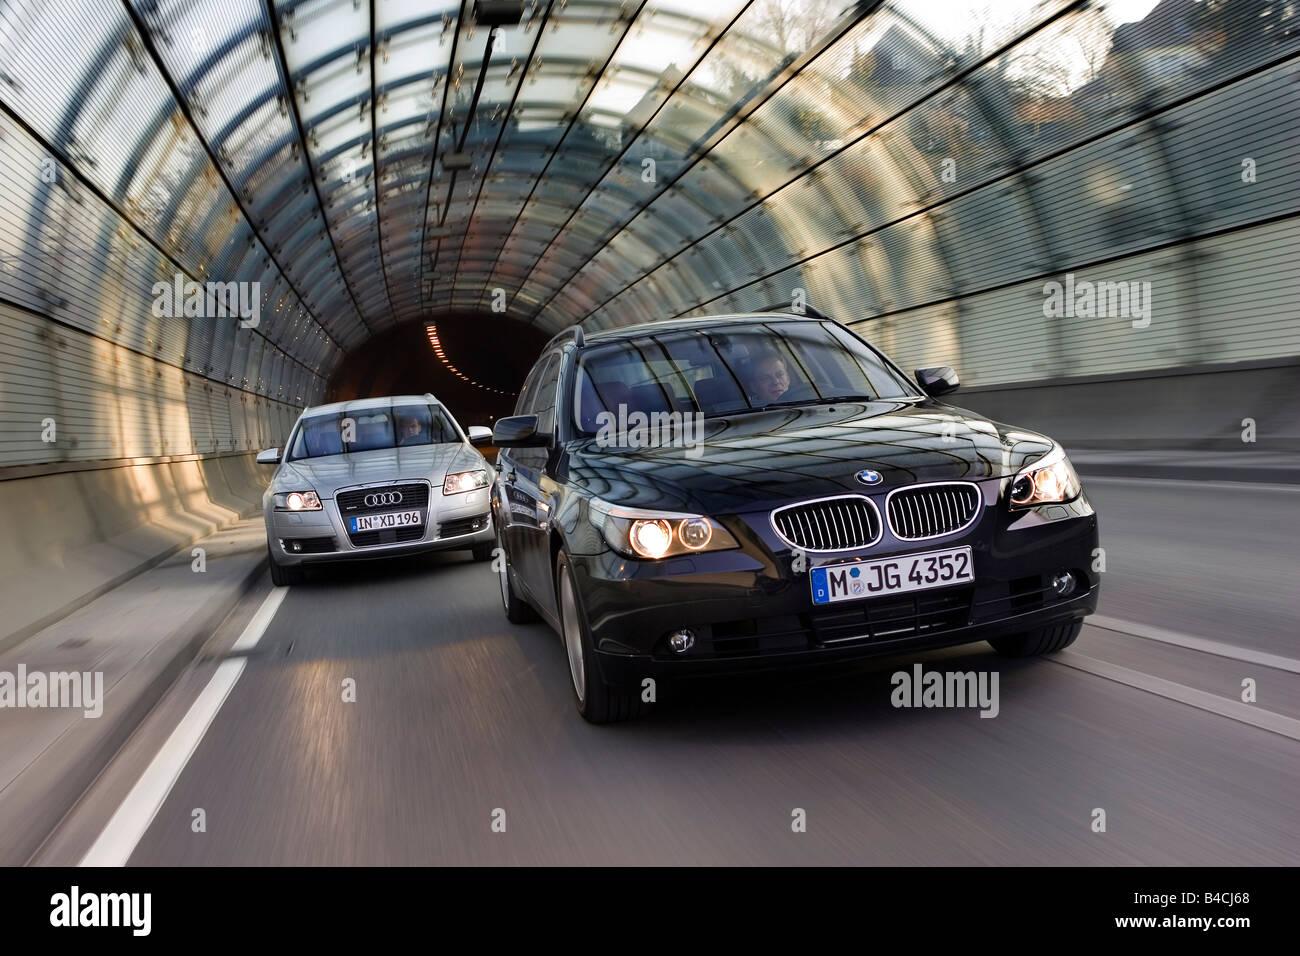 Bmw 550i Touring Black Followed By Audi A6 Avant 4 2 Quattro Stock Photo Alamy